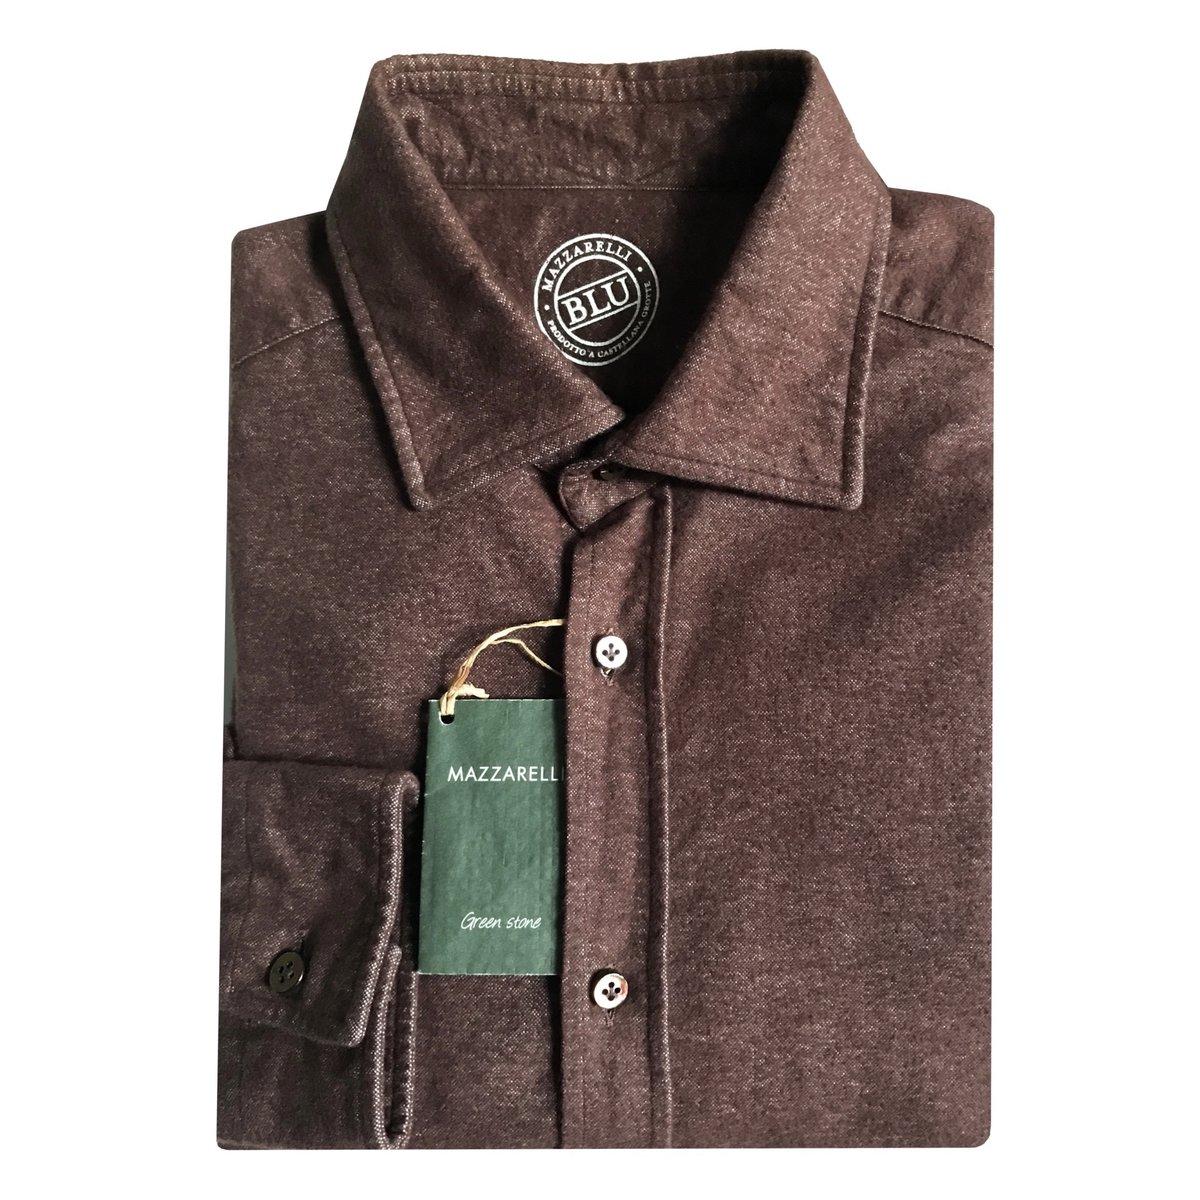 Mazzarelli Brown Slim Fit Moleskin Shirt.jpg